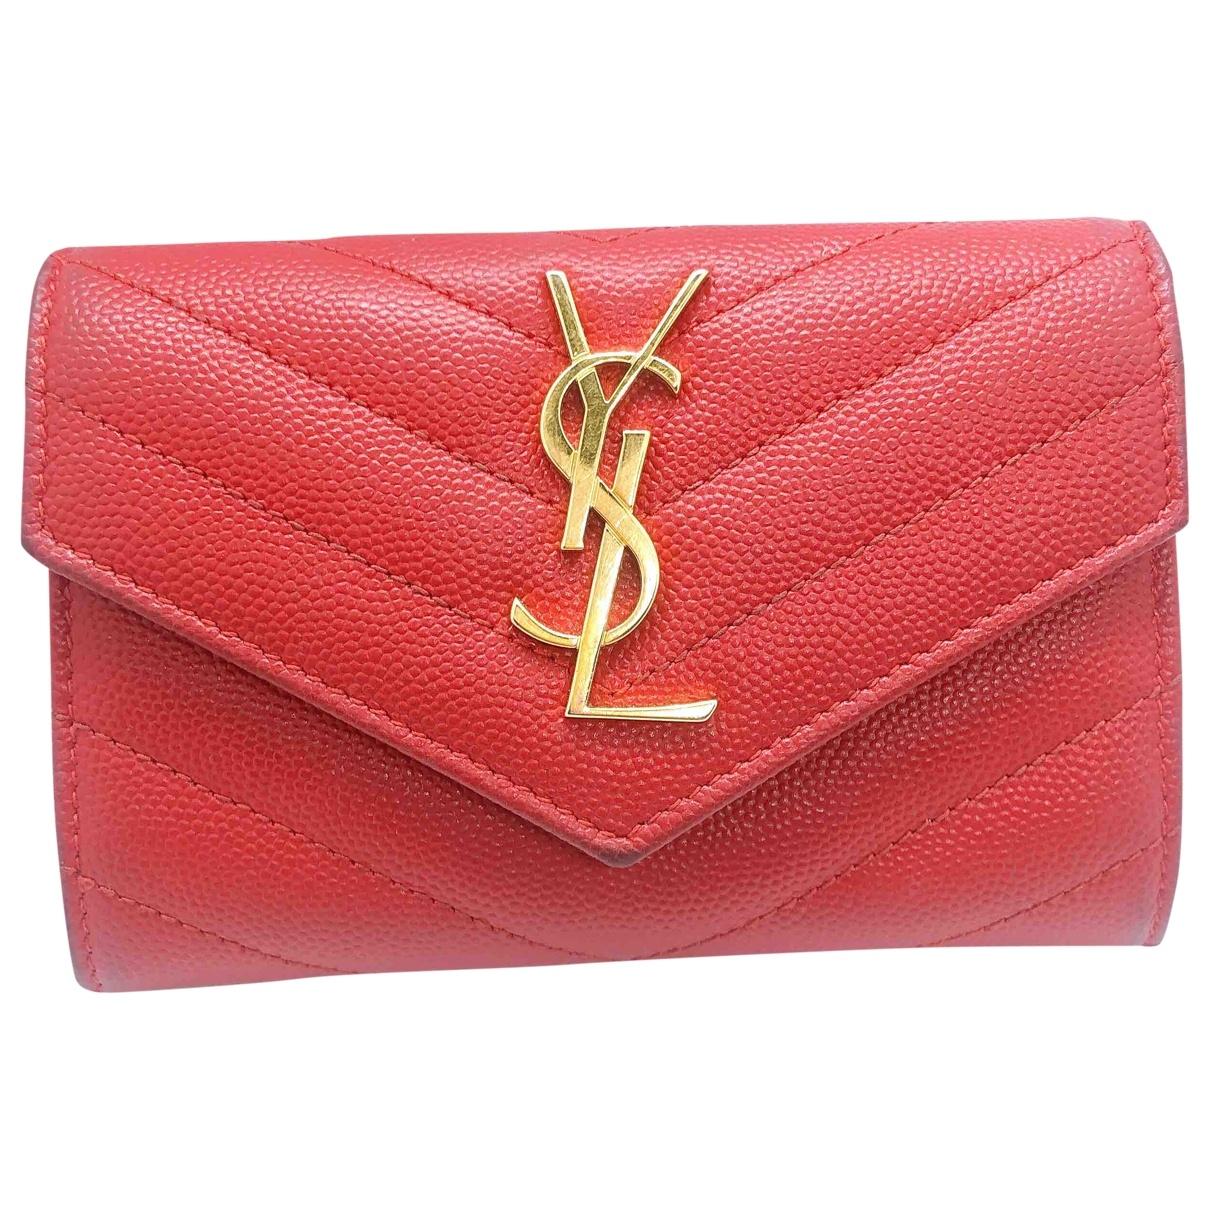 Yves Saint Laurent \N Red Leather wallet for Women \N